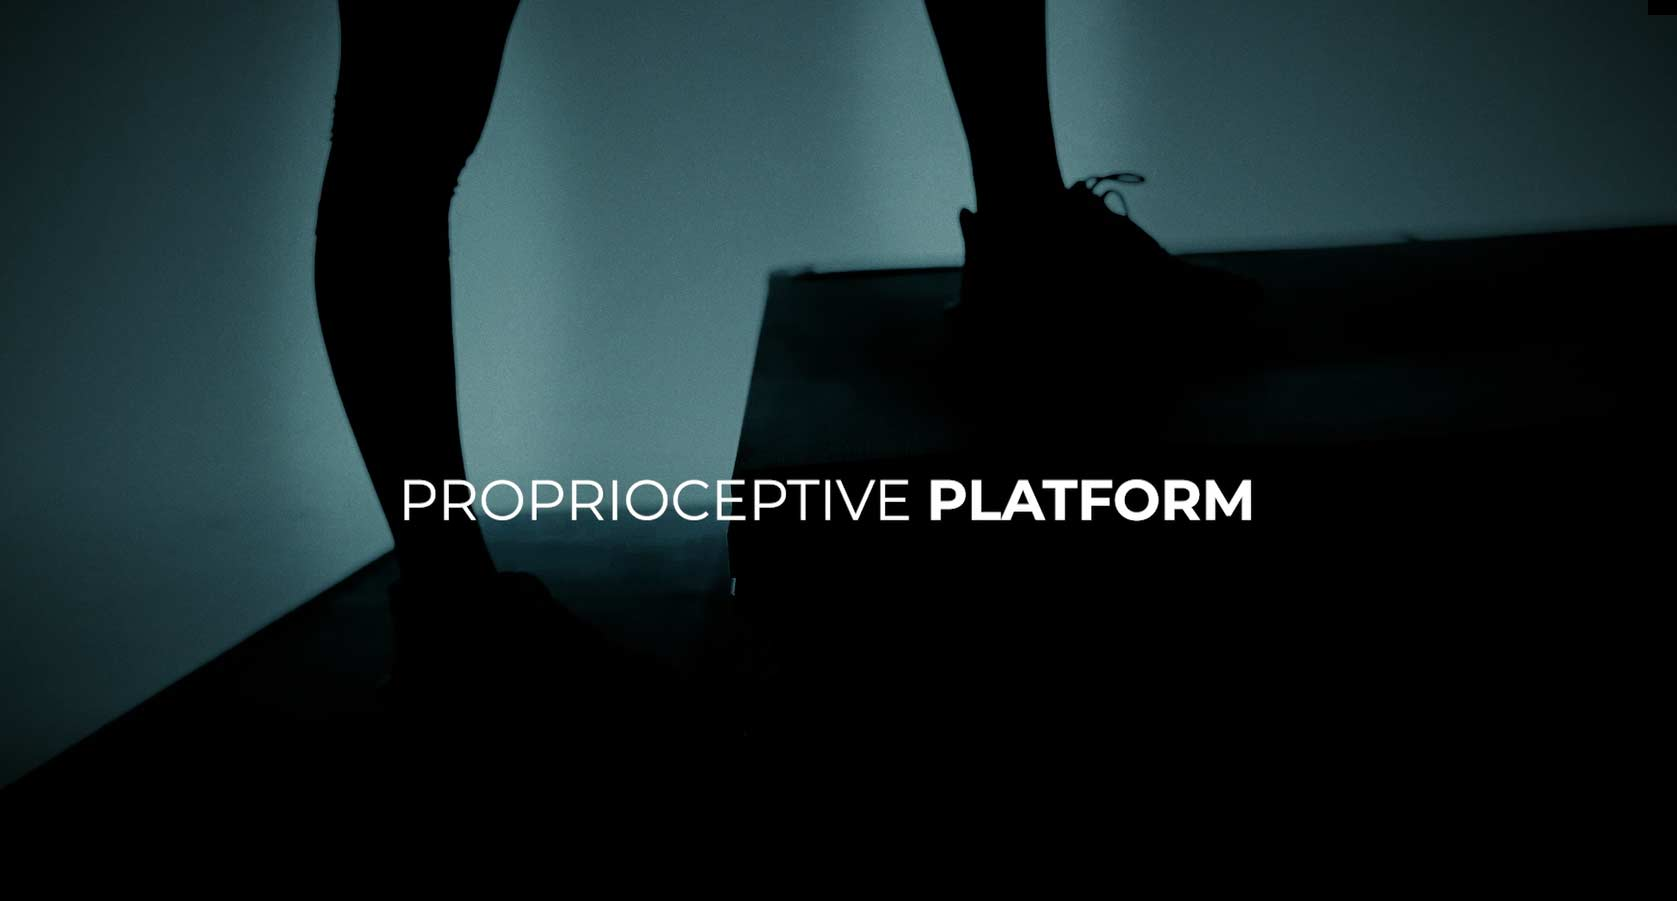 Proprioceptive Platform